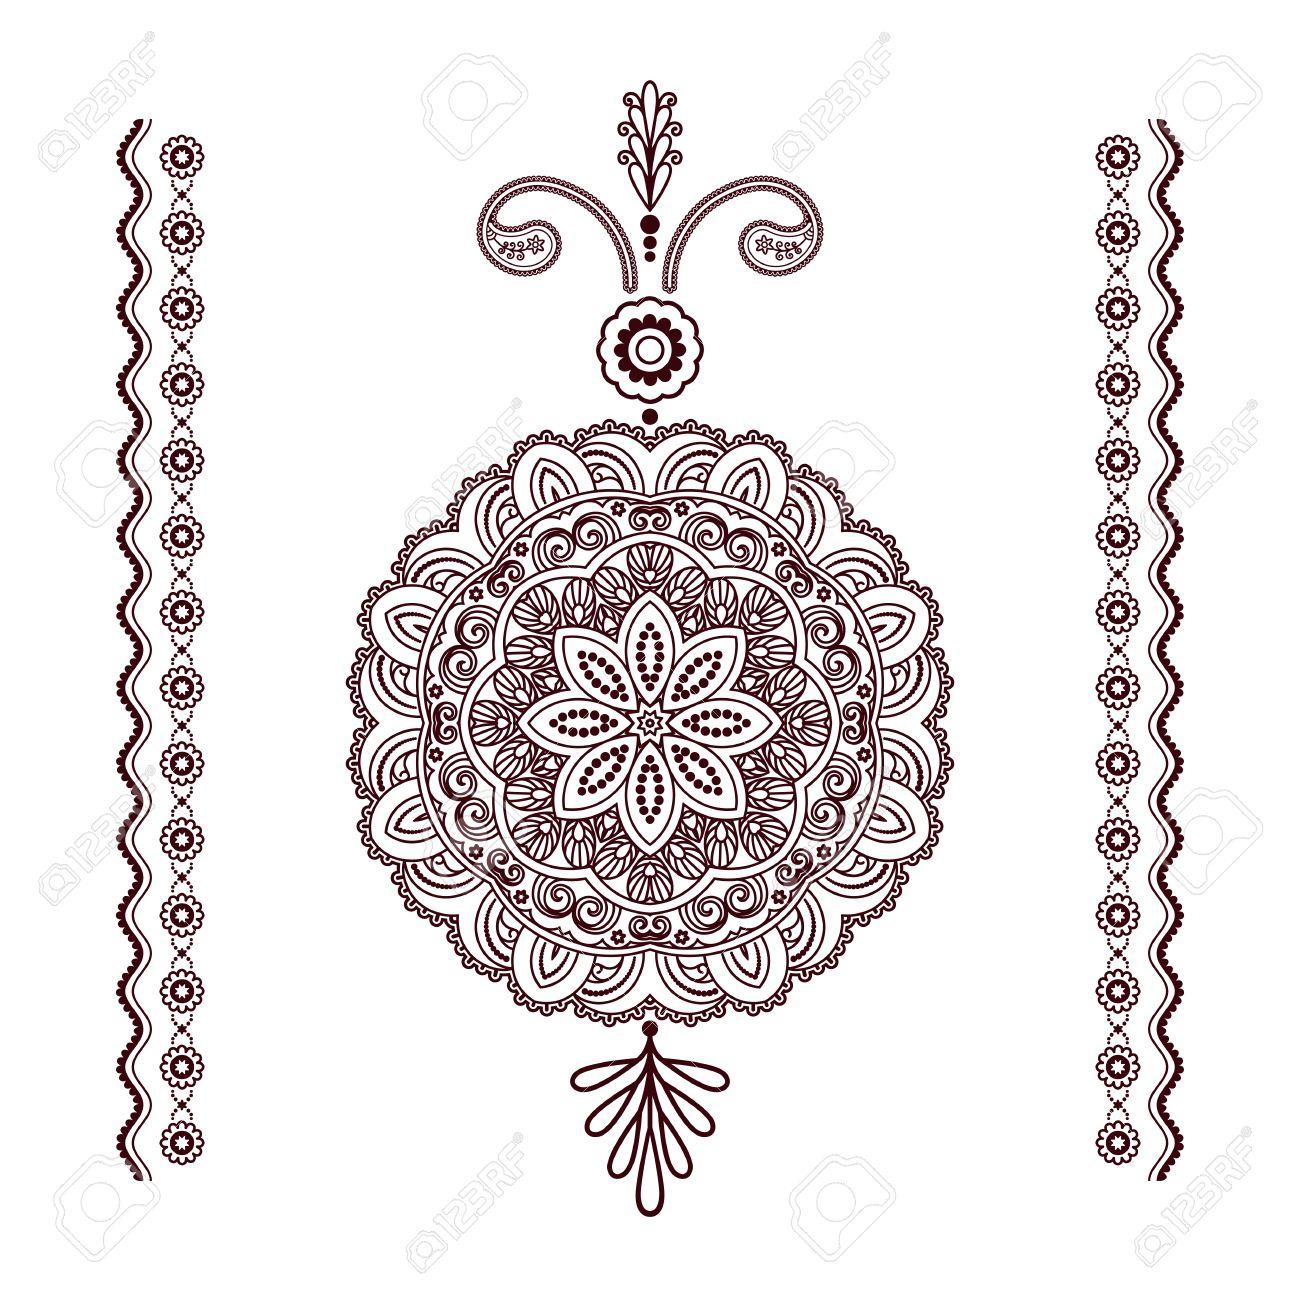 Henna Mandala Pendant With Round Tattoo Ornament And Decorative